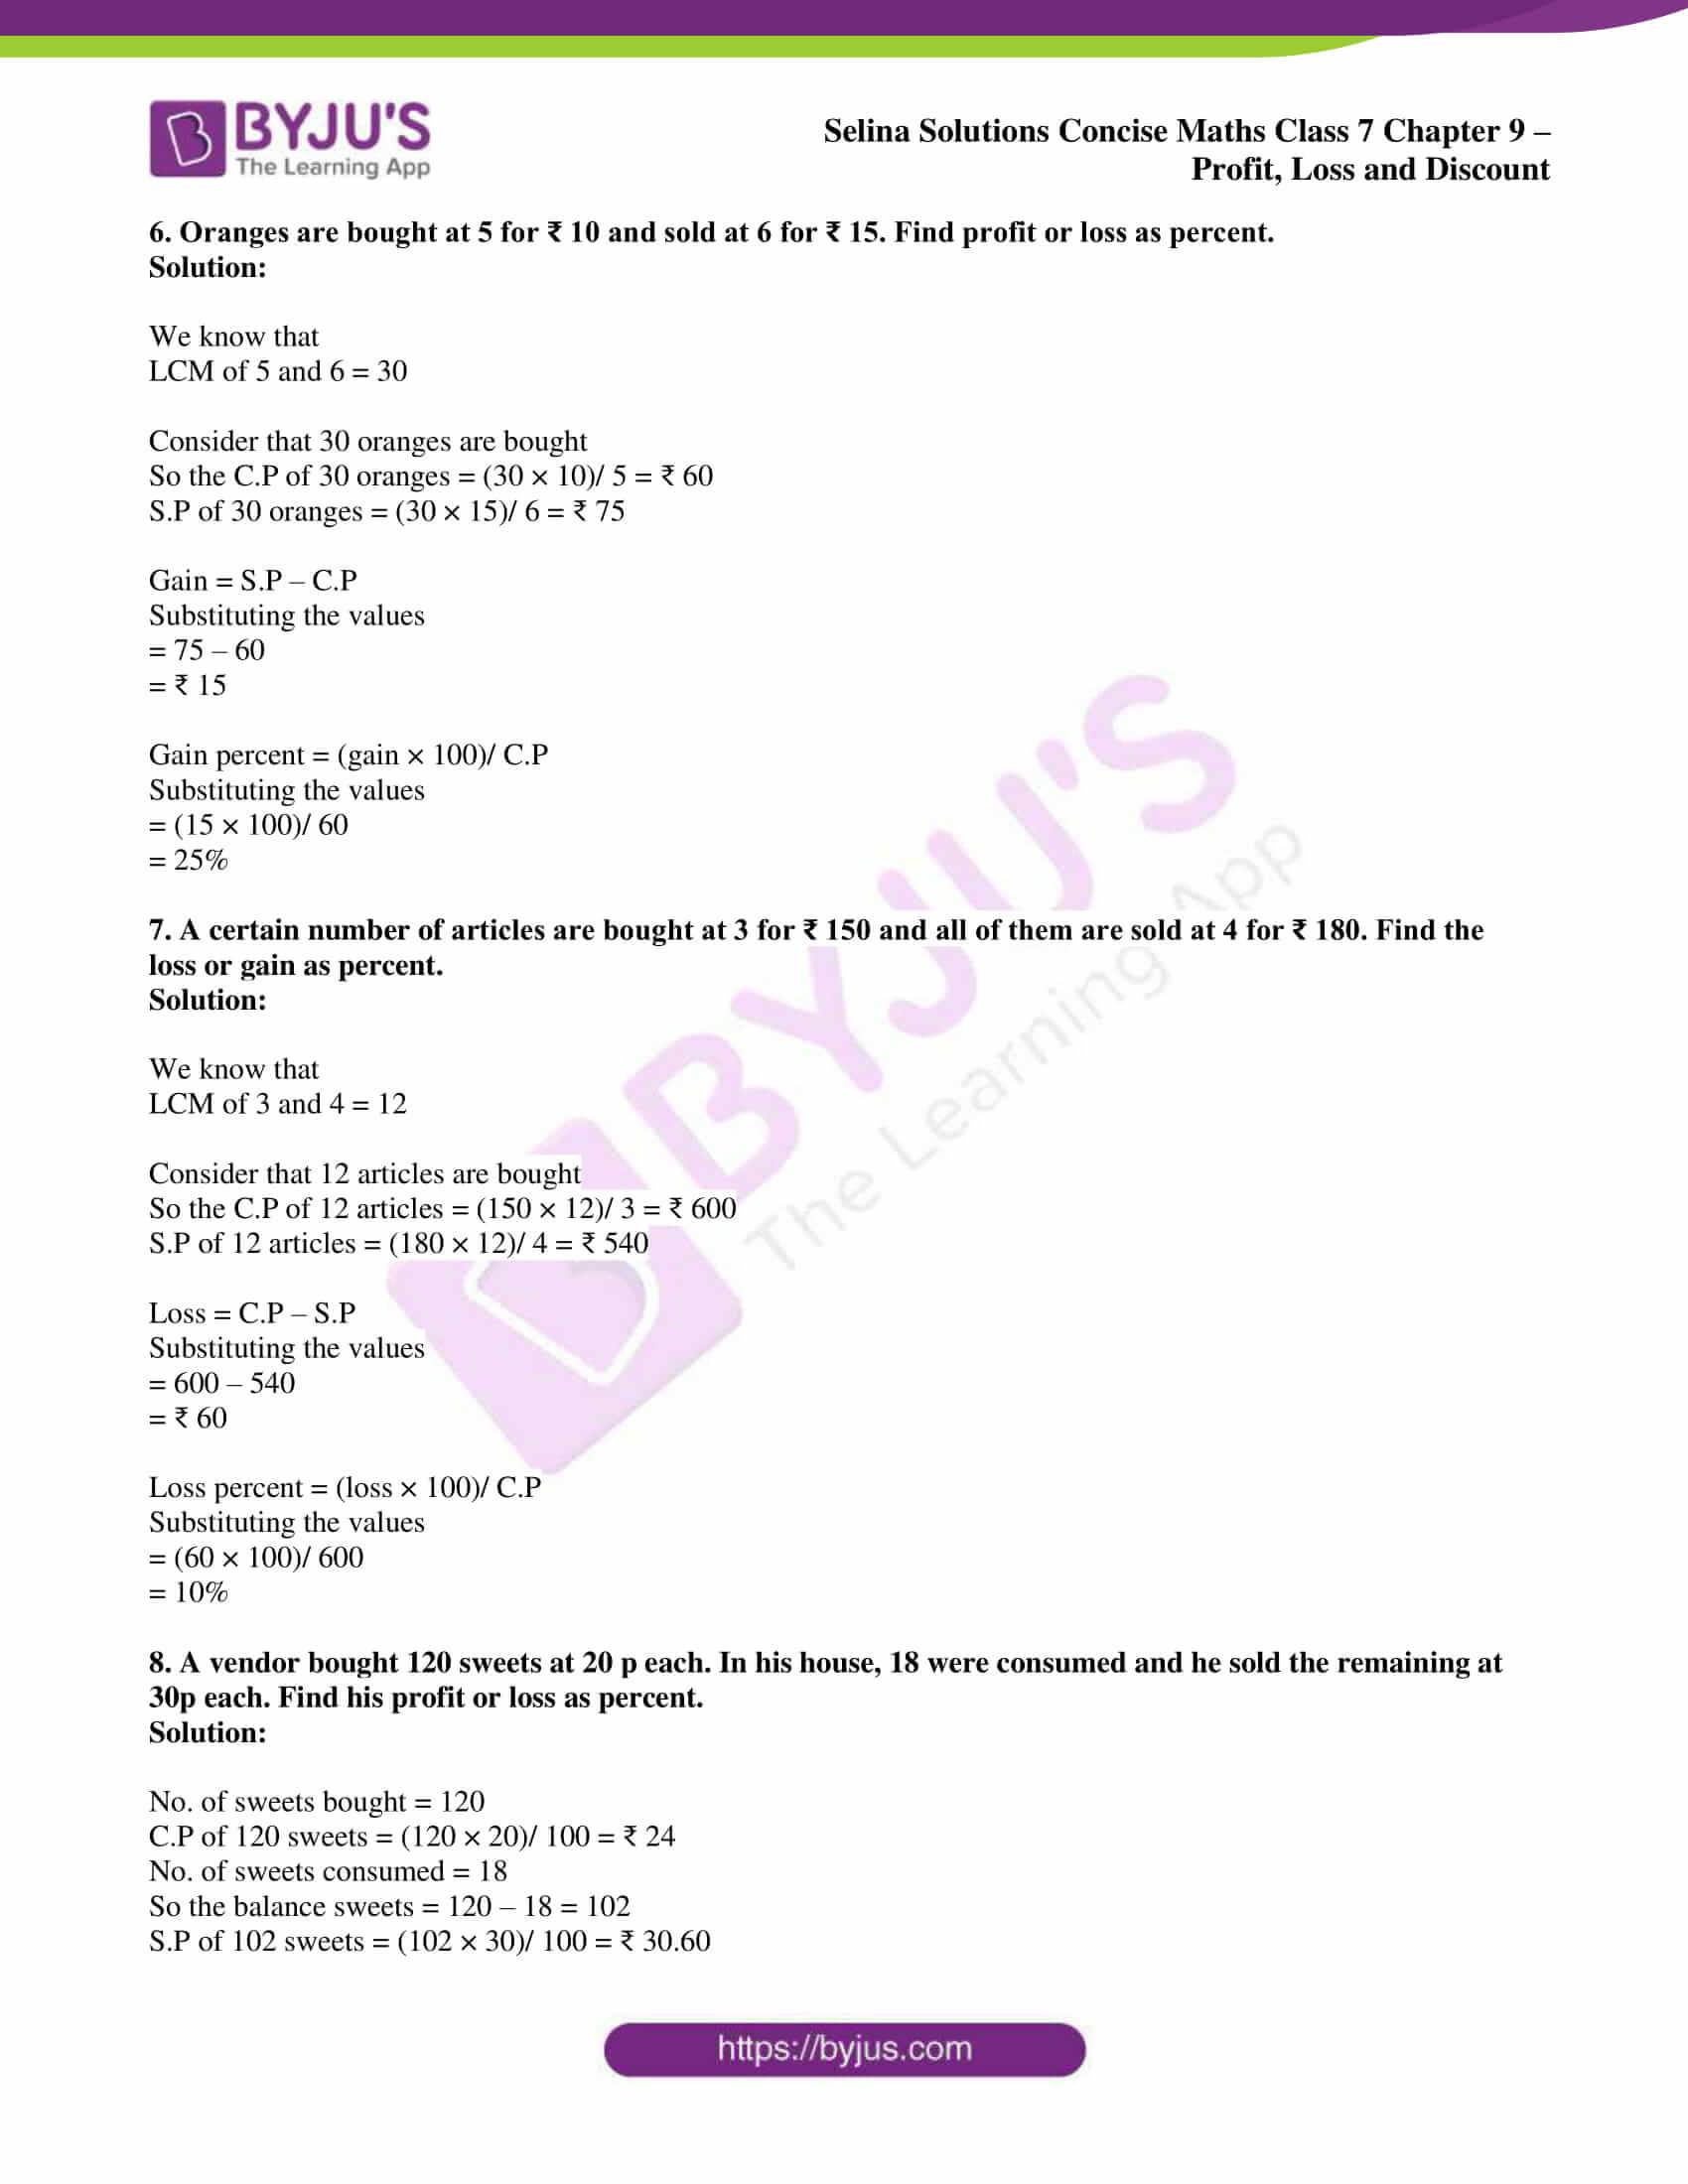 selina sol concise maths class 7 ch9 ex 9a 4